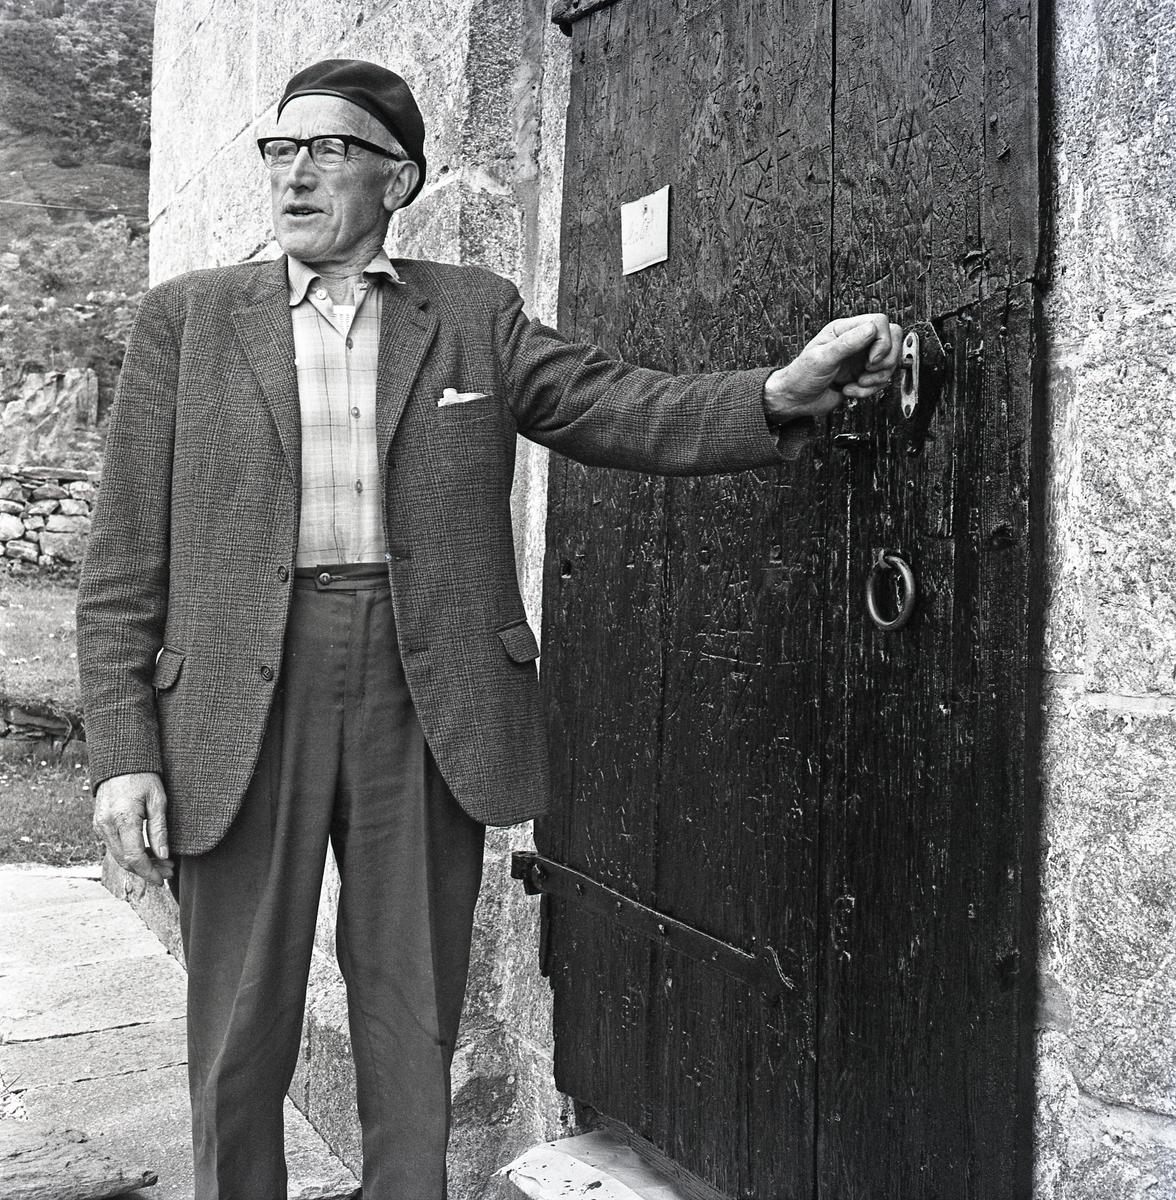 Bømlo - Gamle Moster Kirke - Tilsynsmann Eliot Mikalsen.